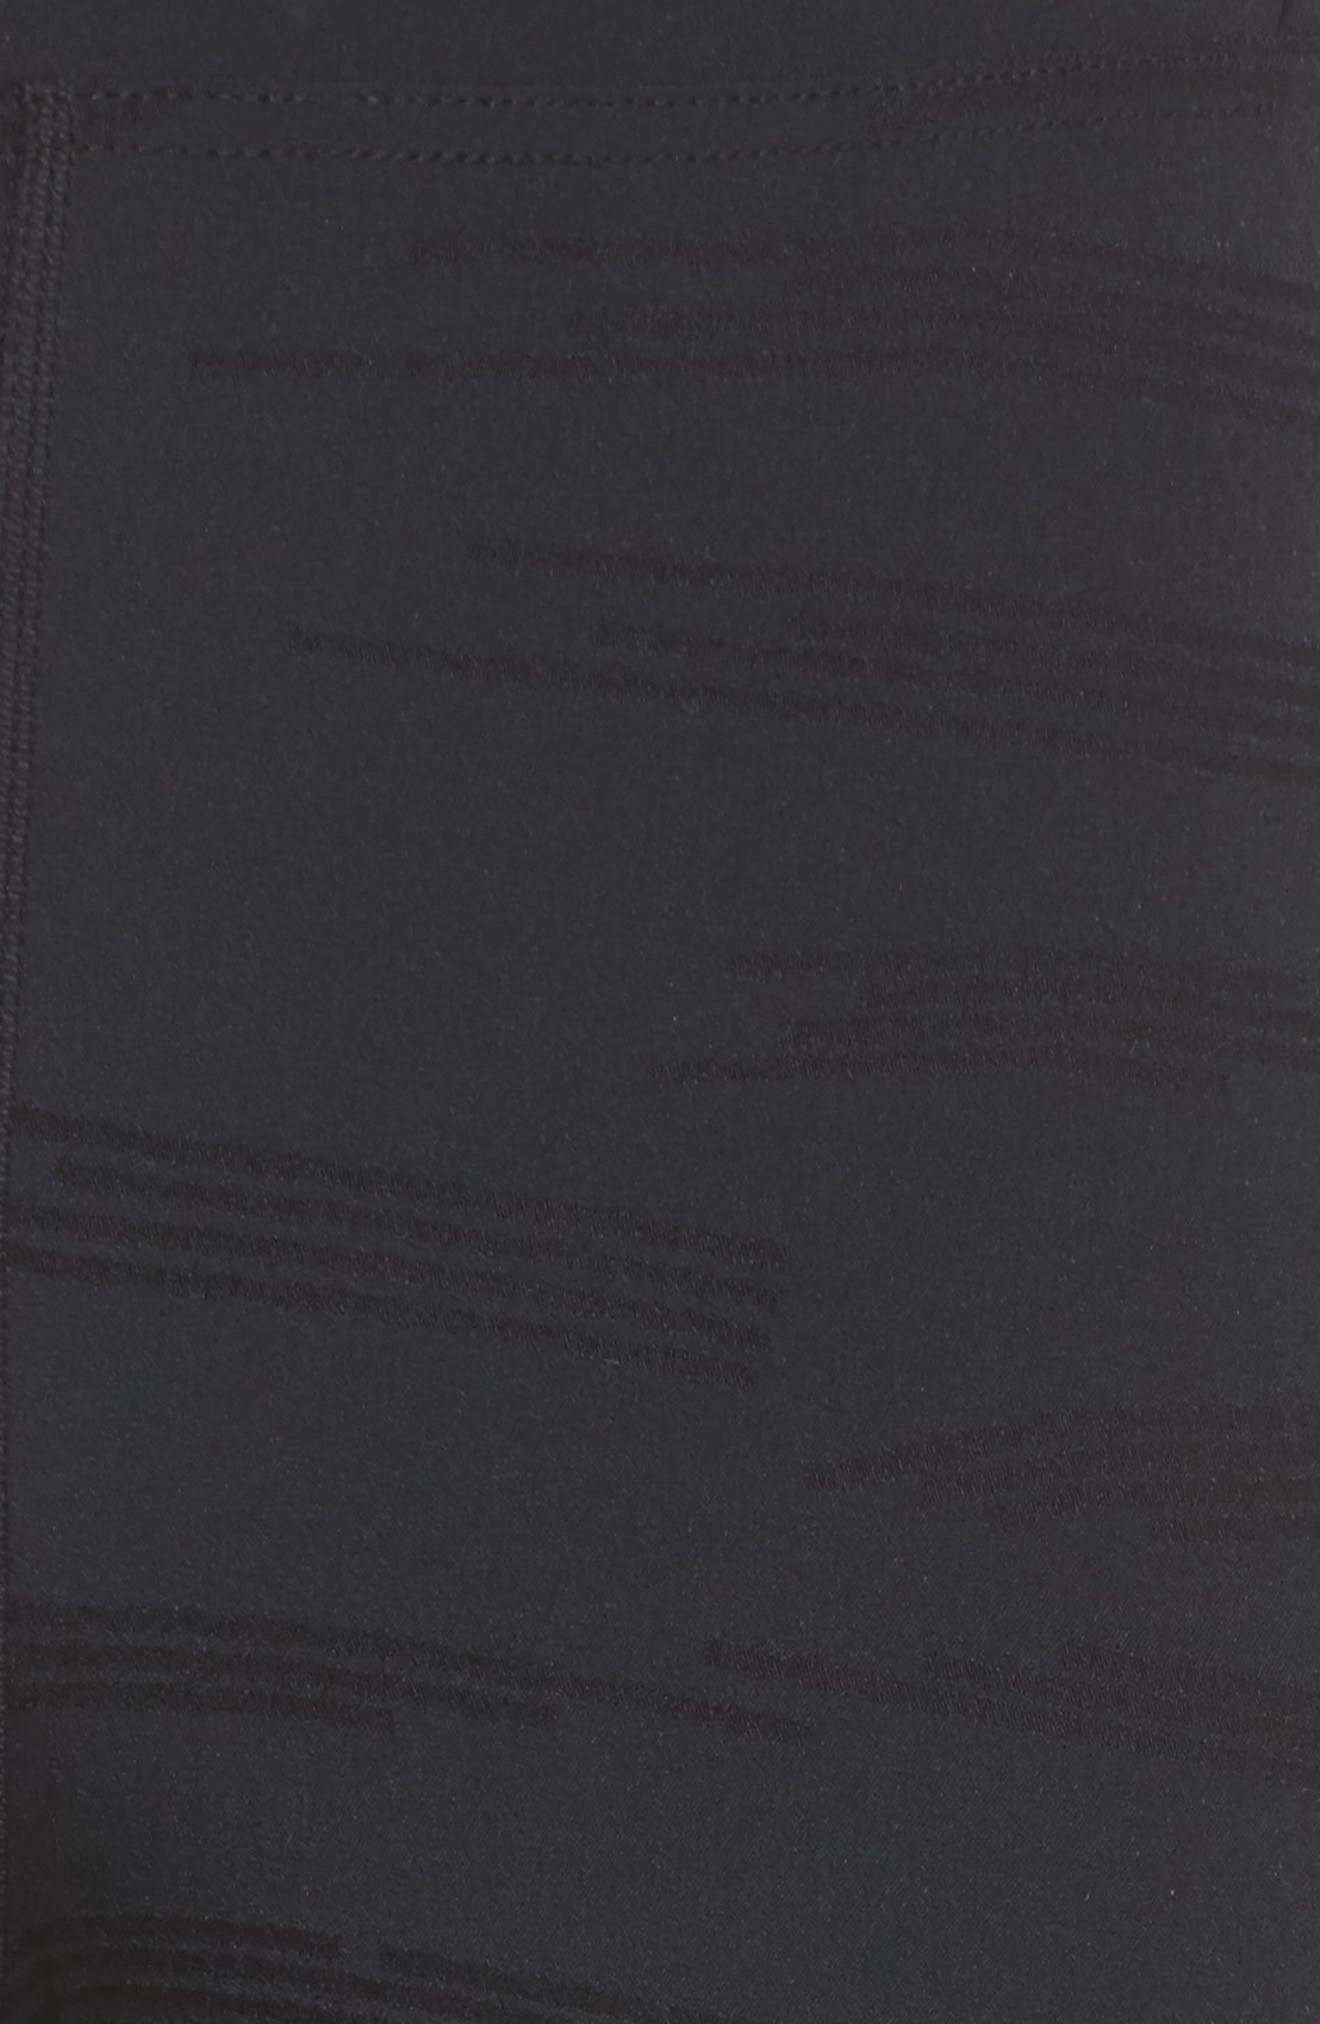 NikeLab ACG Women's Tights,                             Alternate thumbnail 6, color,                             Black